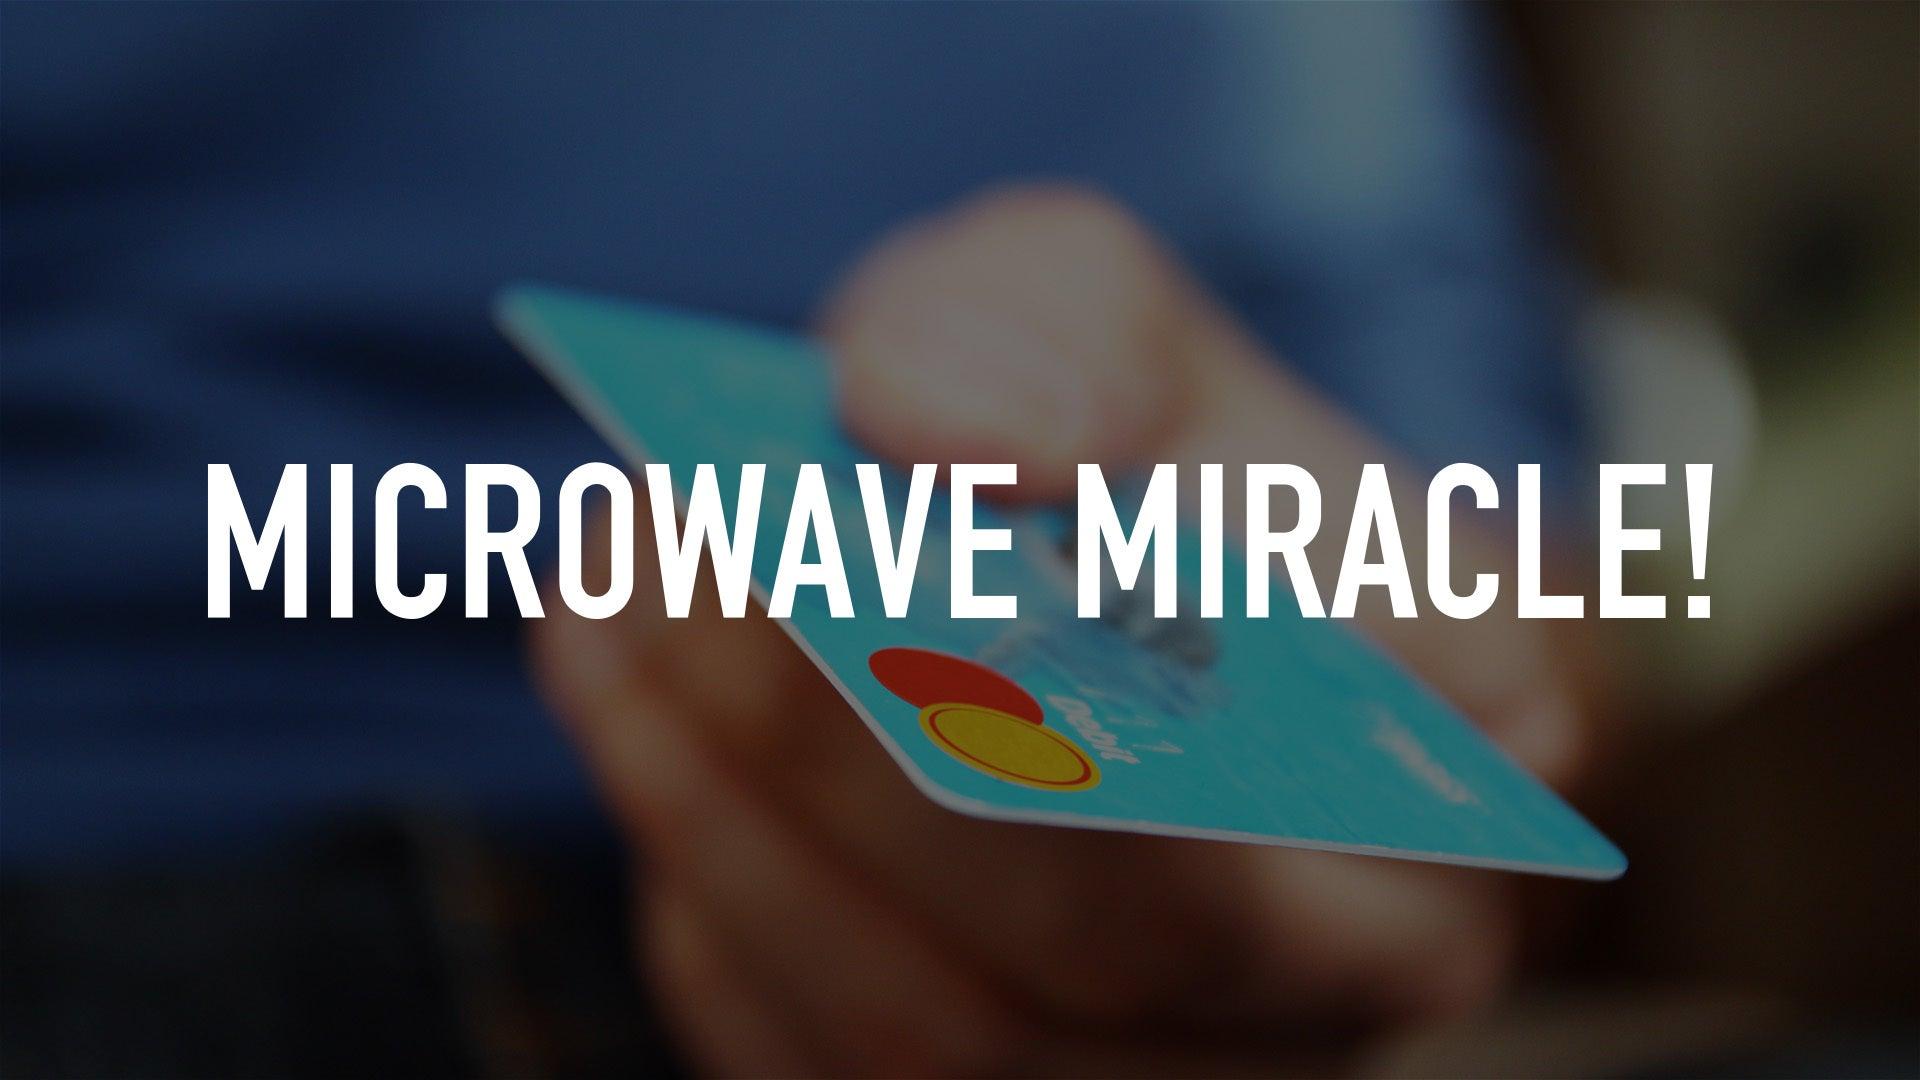 Microwave Miracle!